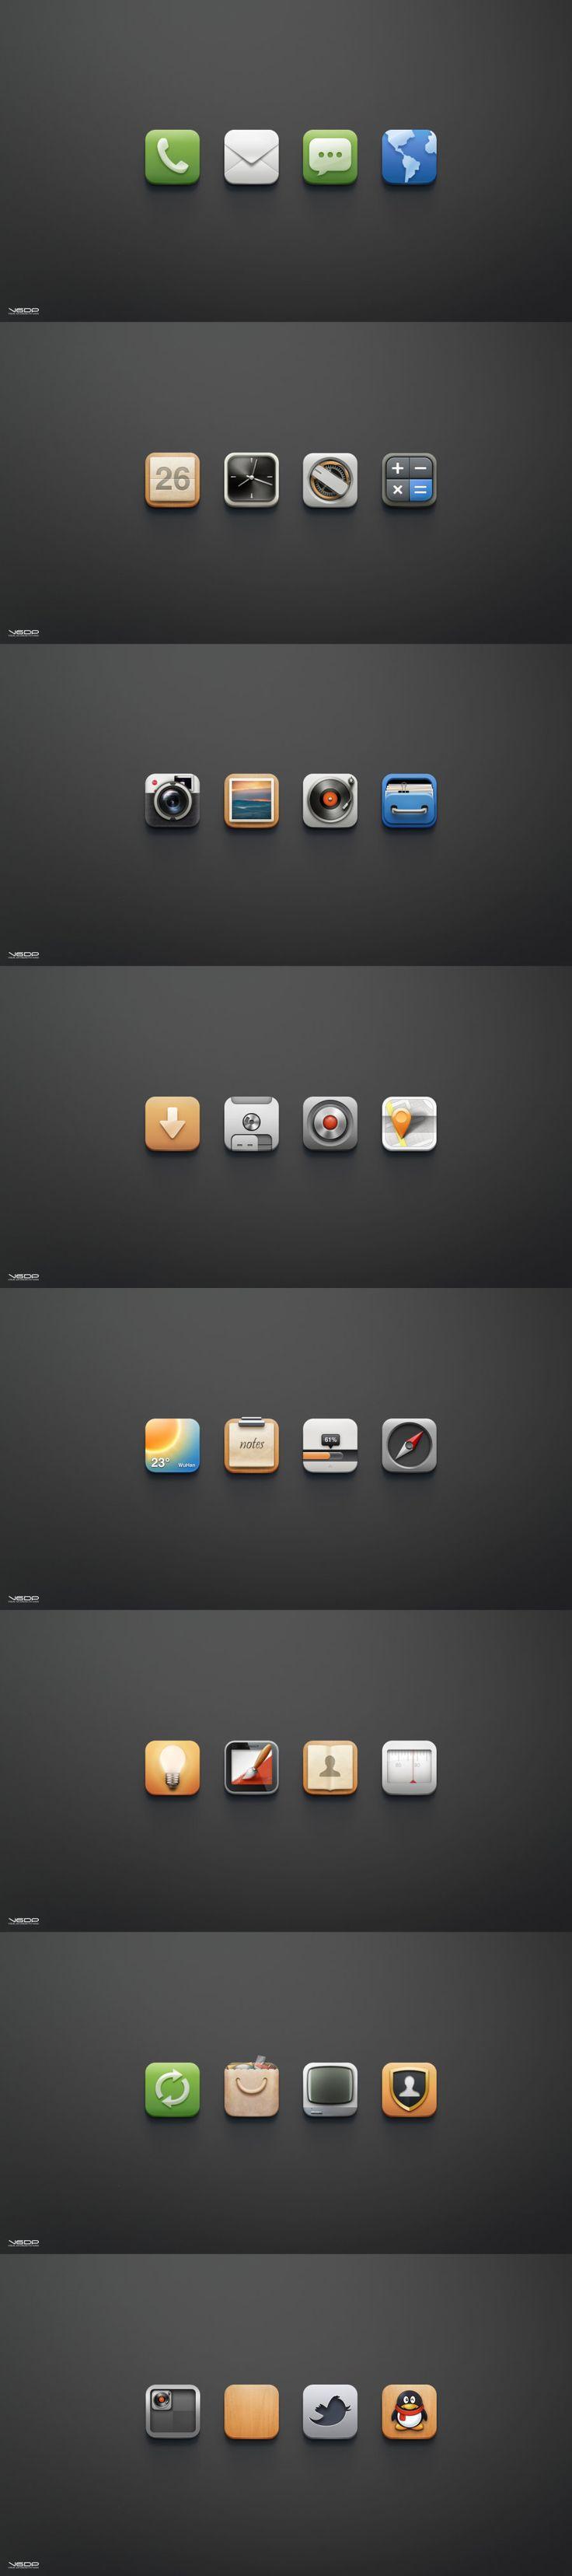 #ui #icon #mobile